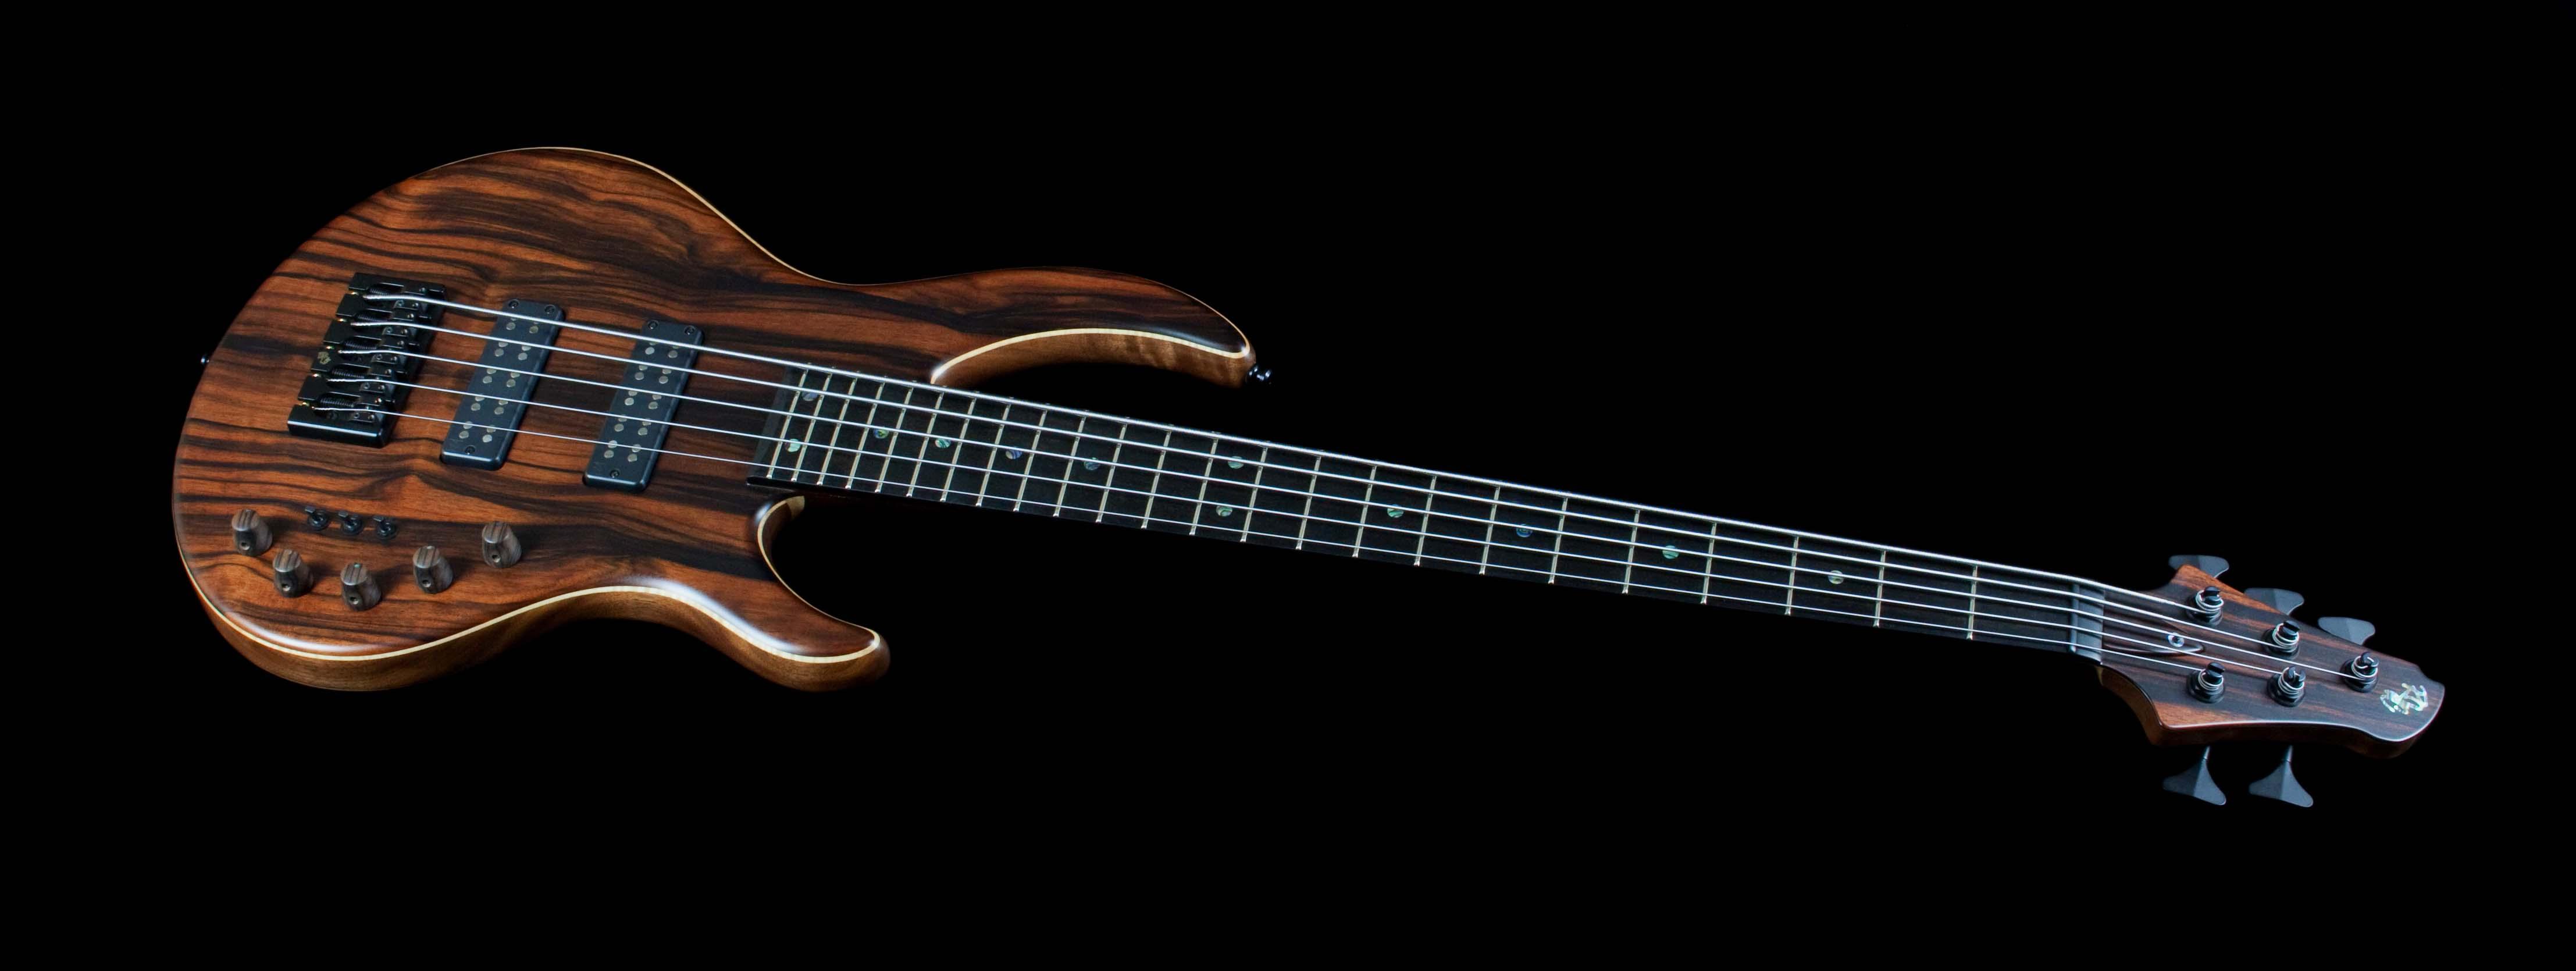 RJ's custom basses | The Bass Shop Syd